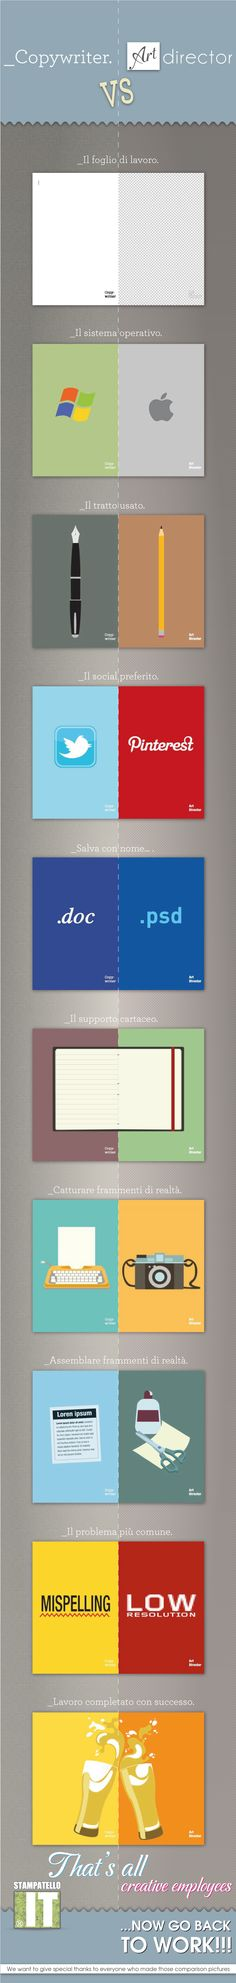 Copy-vs-art  bellissima infografica!    Muy buena gráficamente pero muy estúpida conceptualmente.